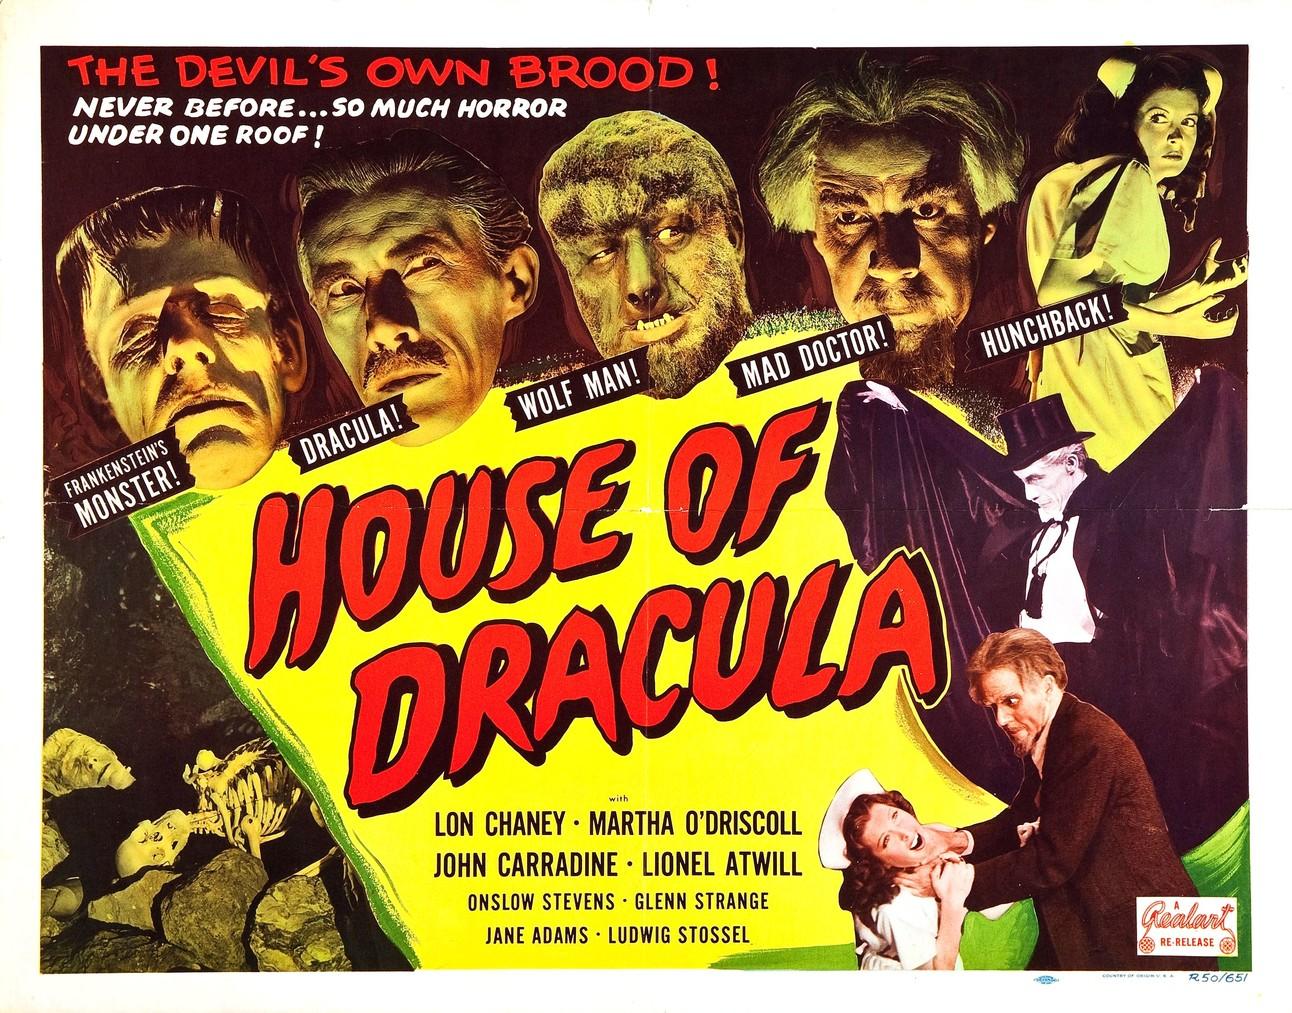 house_of_dracula_poster_03.jpg